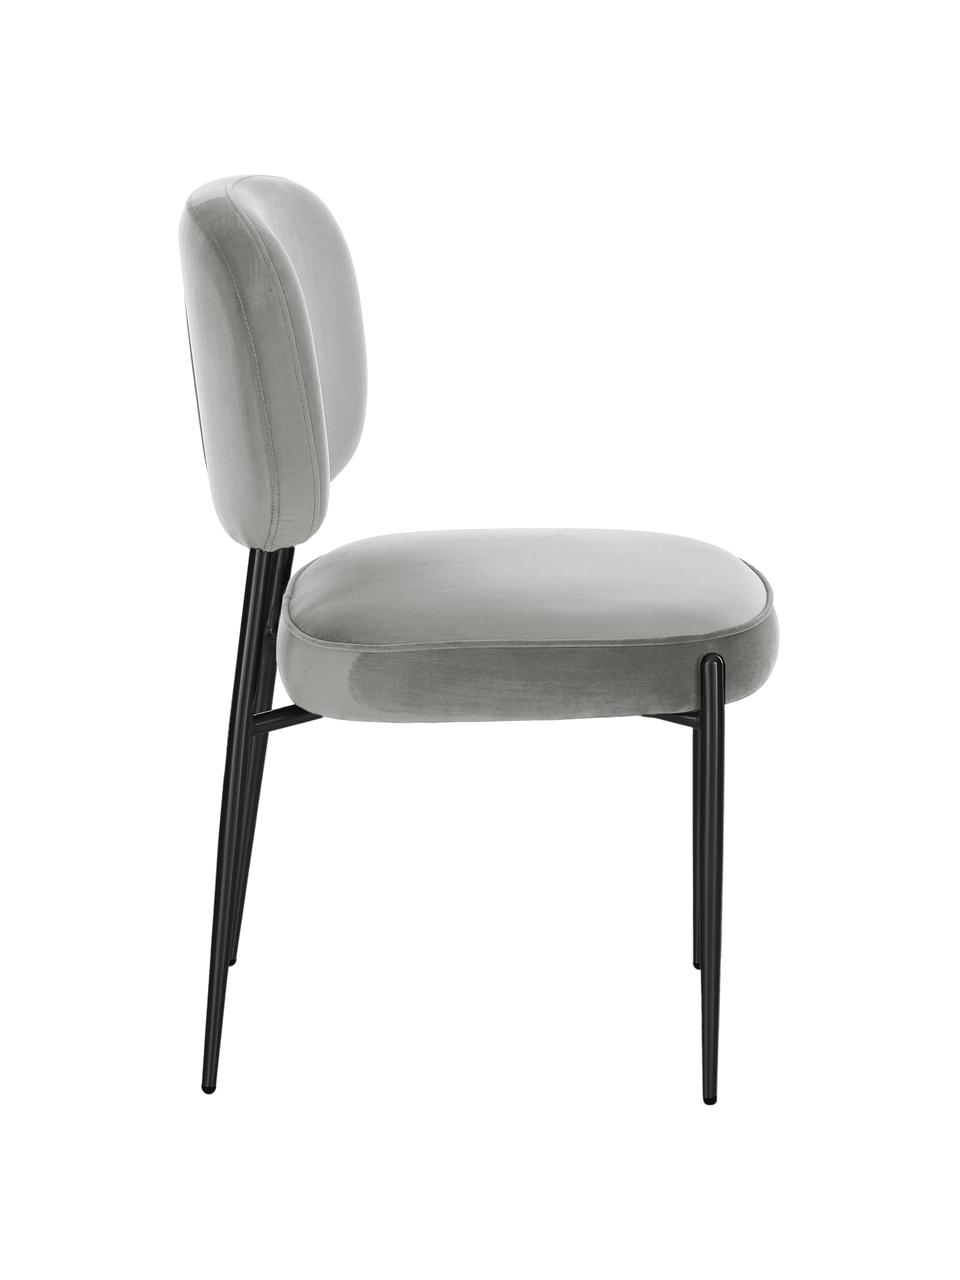 Sedia imbottita in velluto Viggo, Rivestimento: velluto (poliestere) 50.0, Velluto grigio, gambe nero, Larg. 49 x Prof. 66 cm